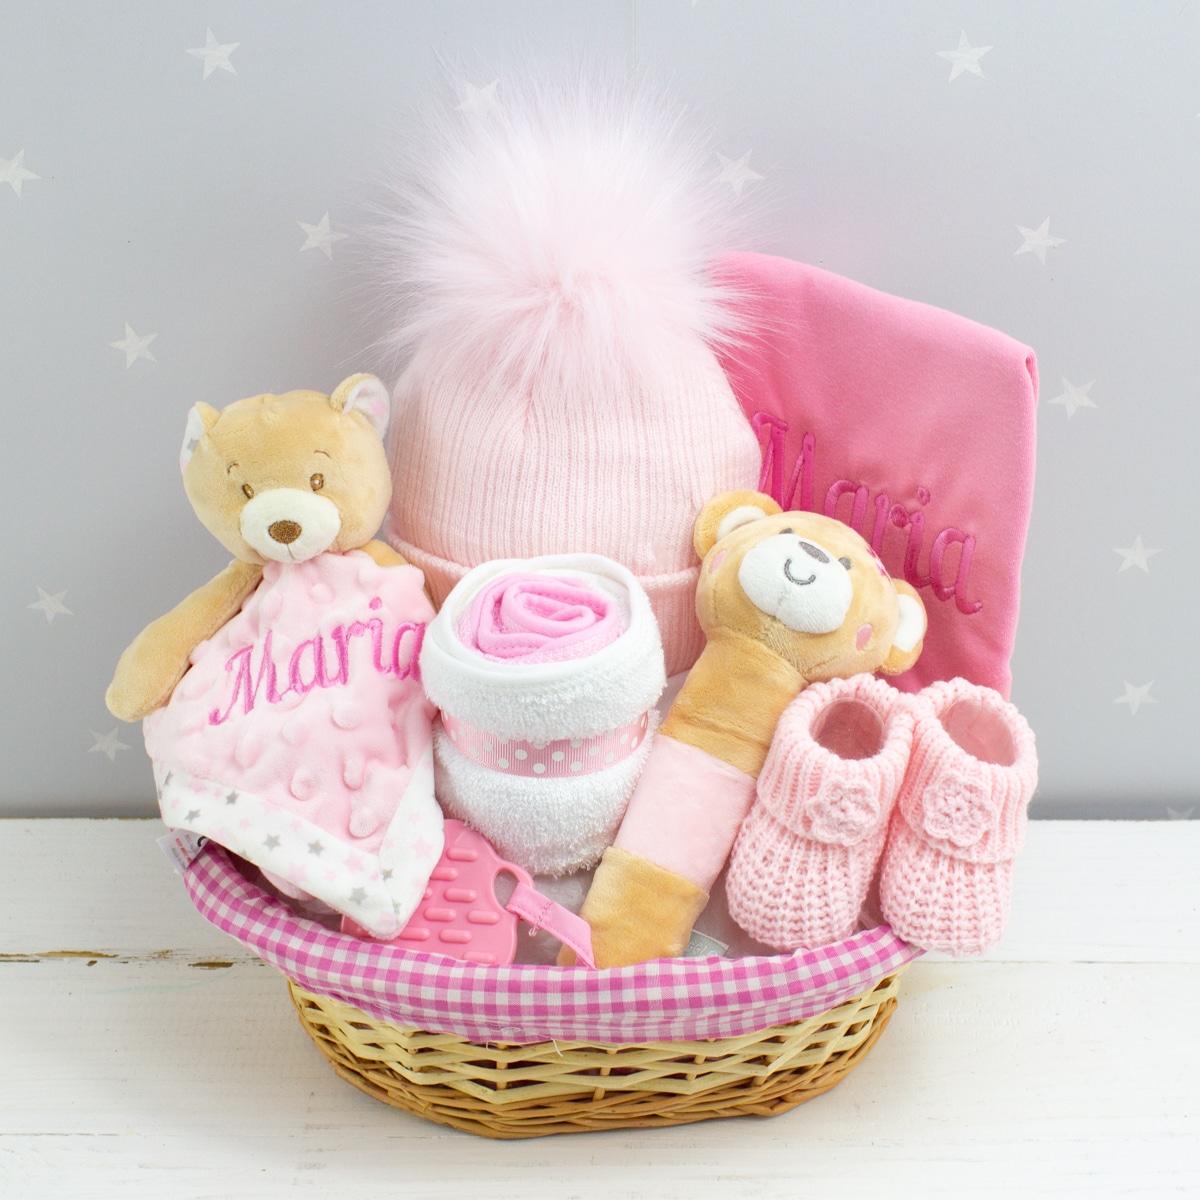 Personalised Baby Girl Gift Hamper